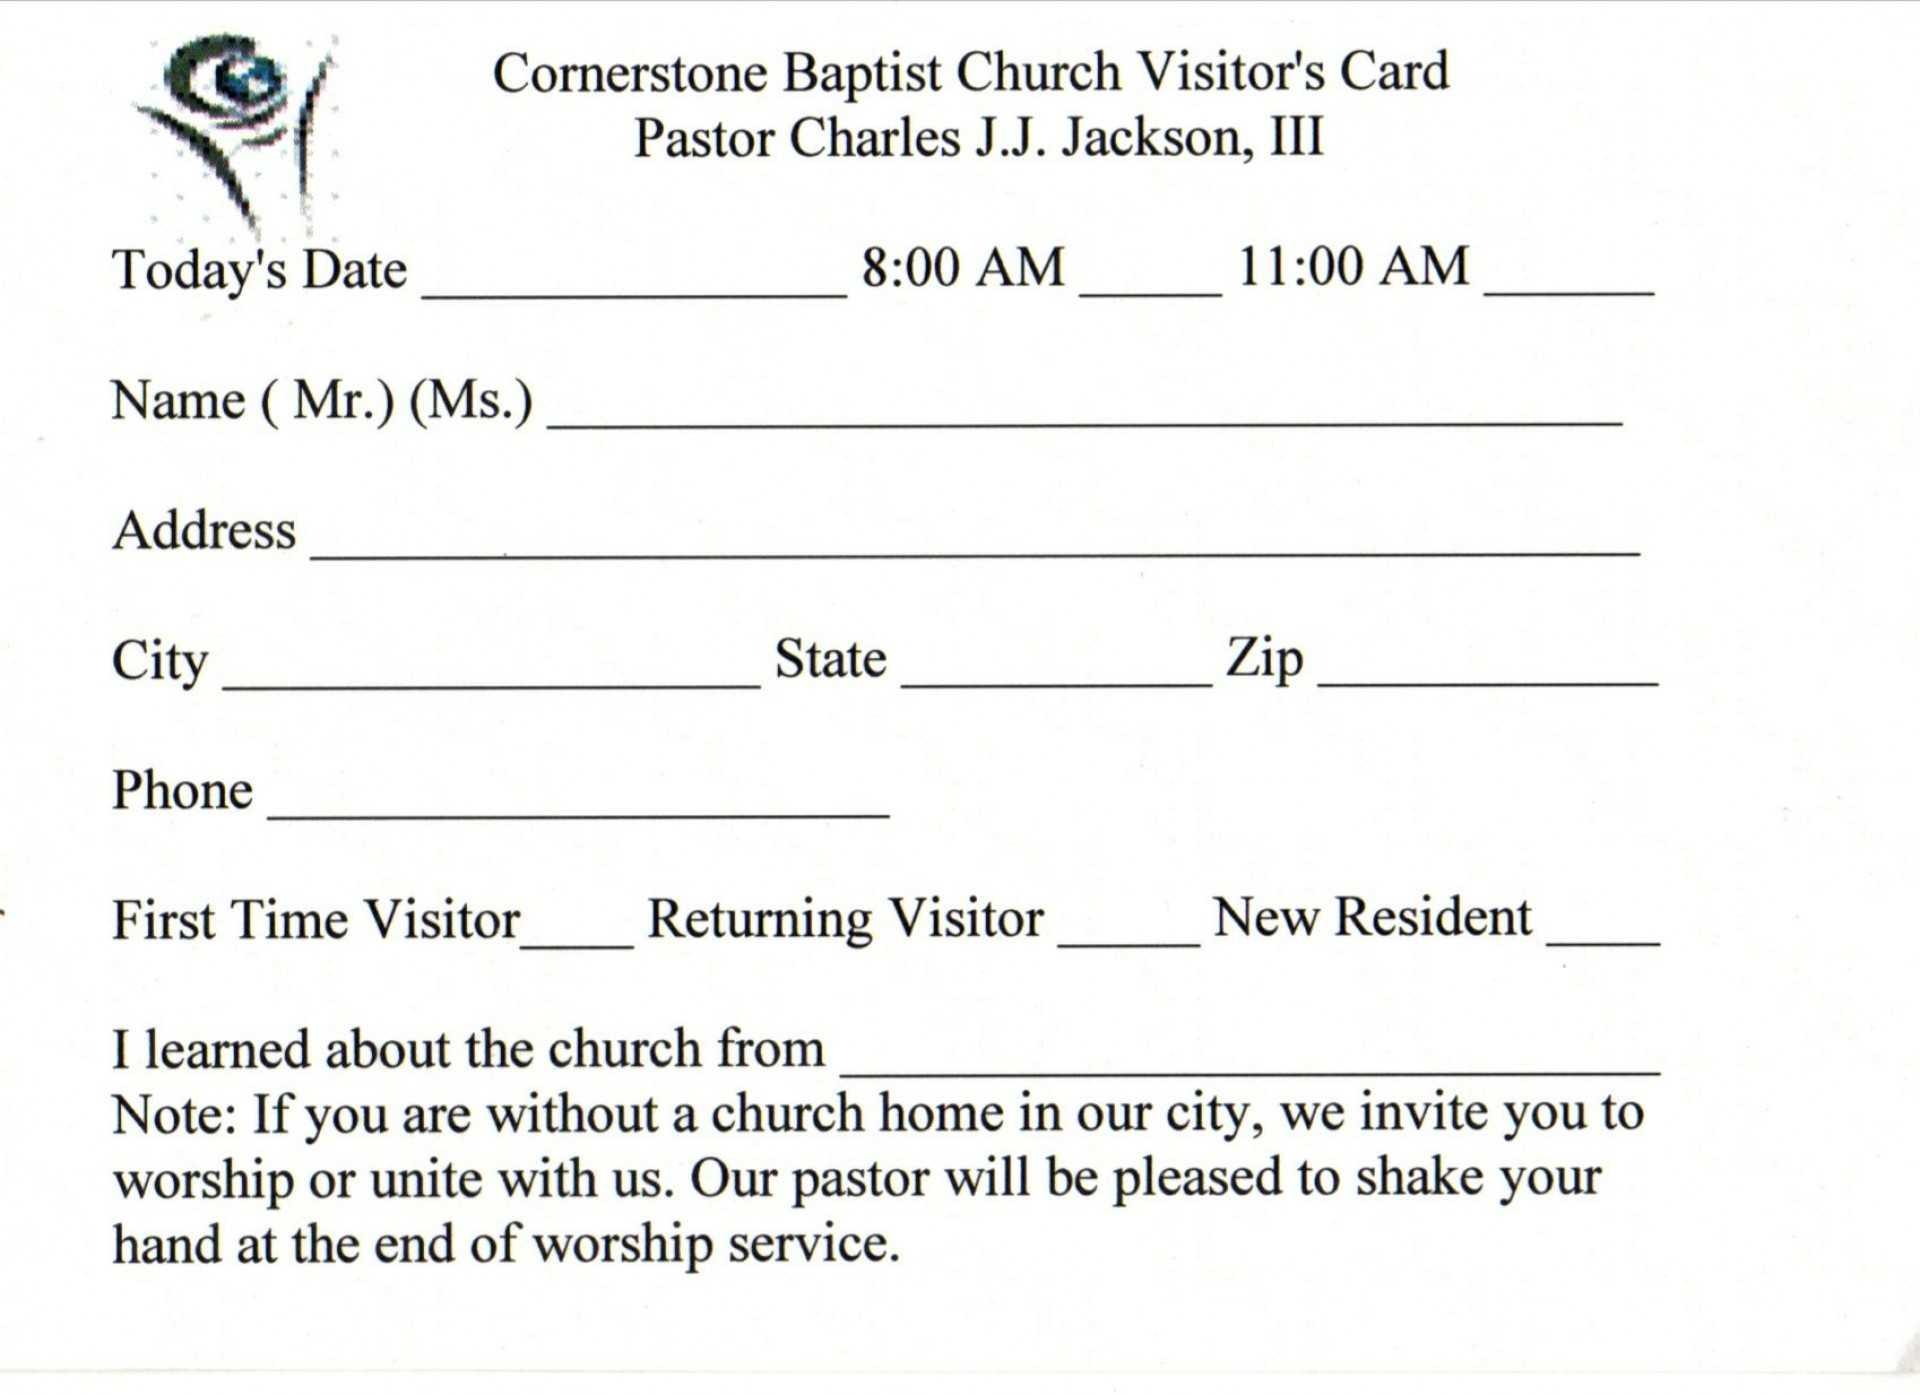 019 Template Ideas Church Visitor Card Word Impressive Inside Church Visitor Card Template